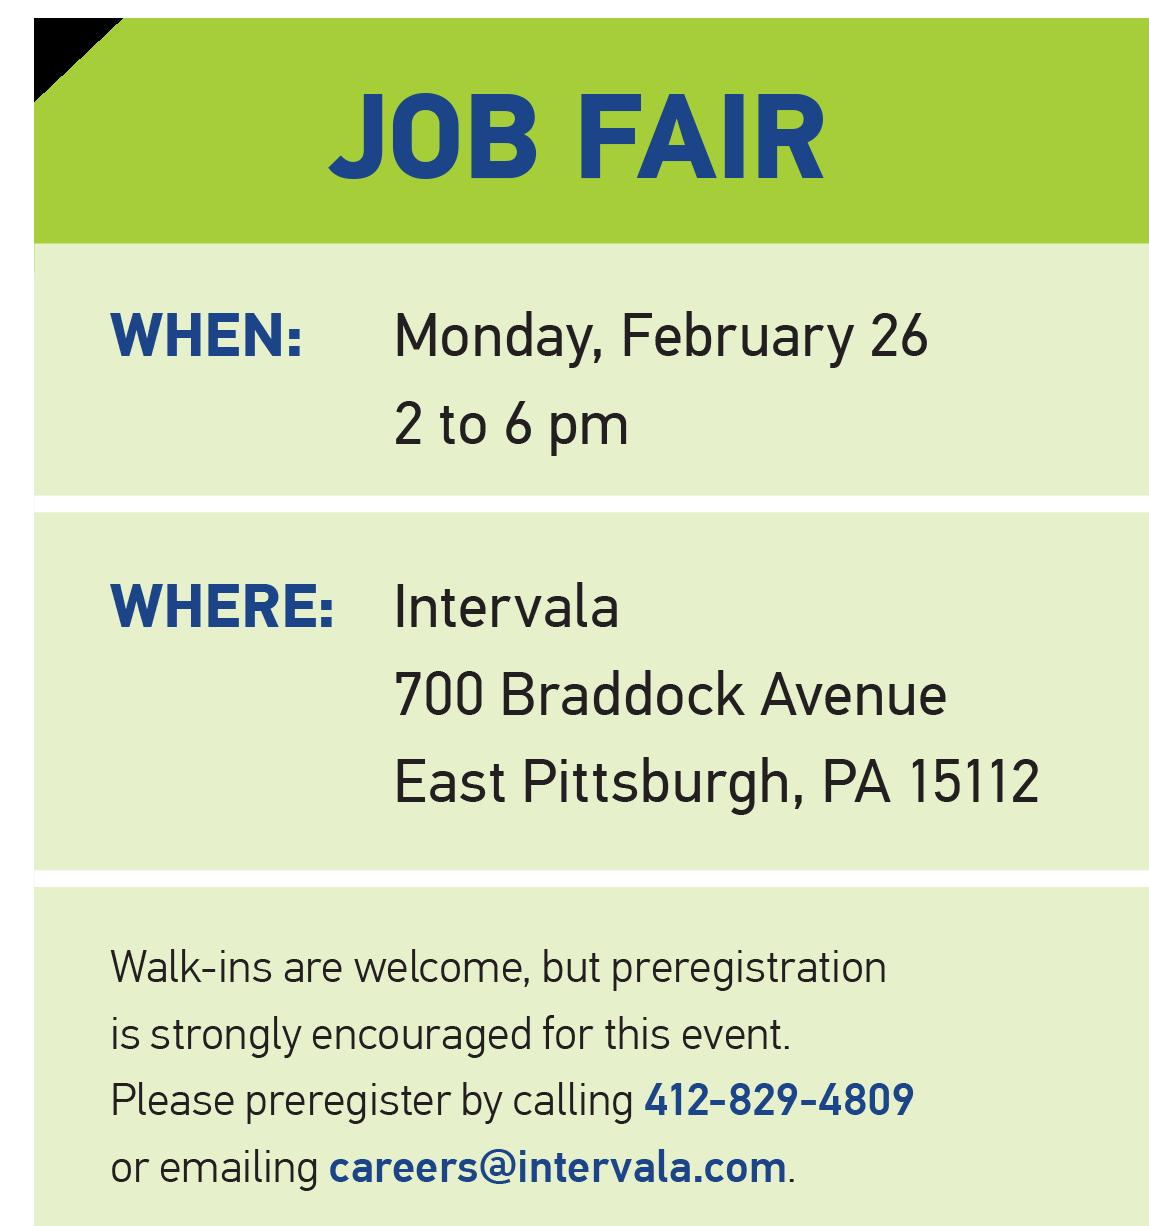 Job Fair Info Block_Call_Email.png